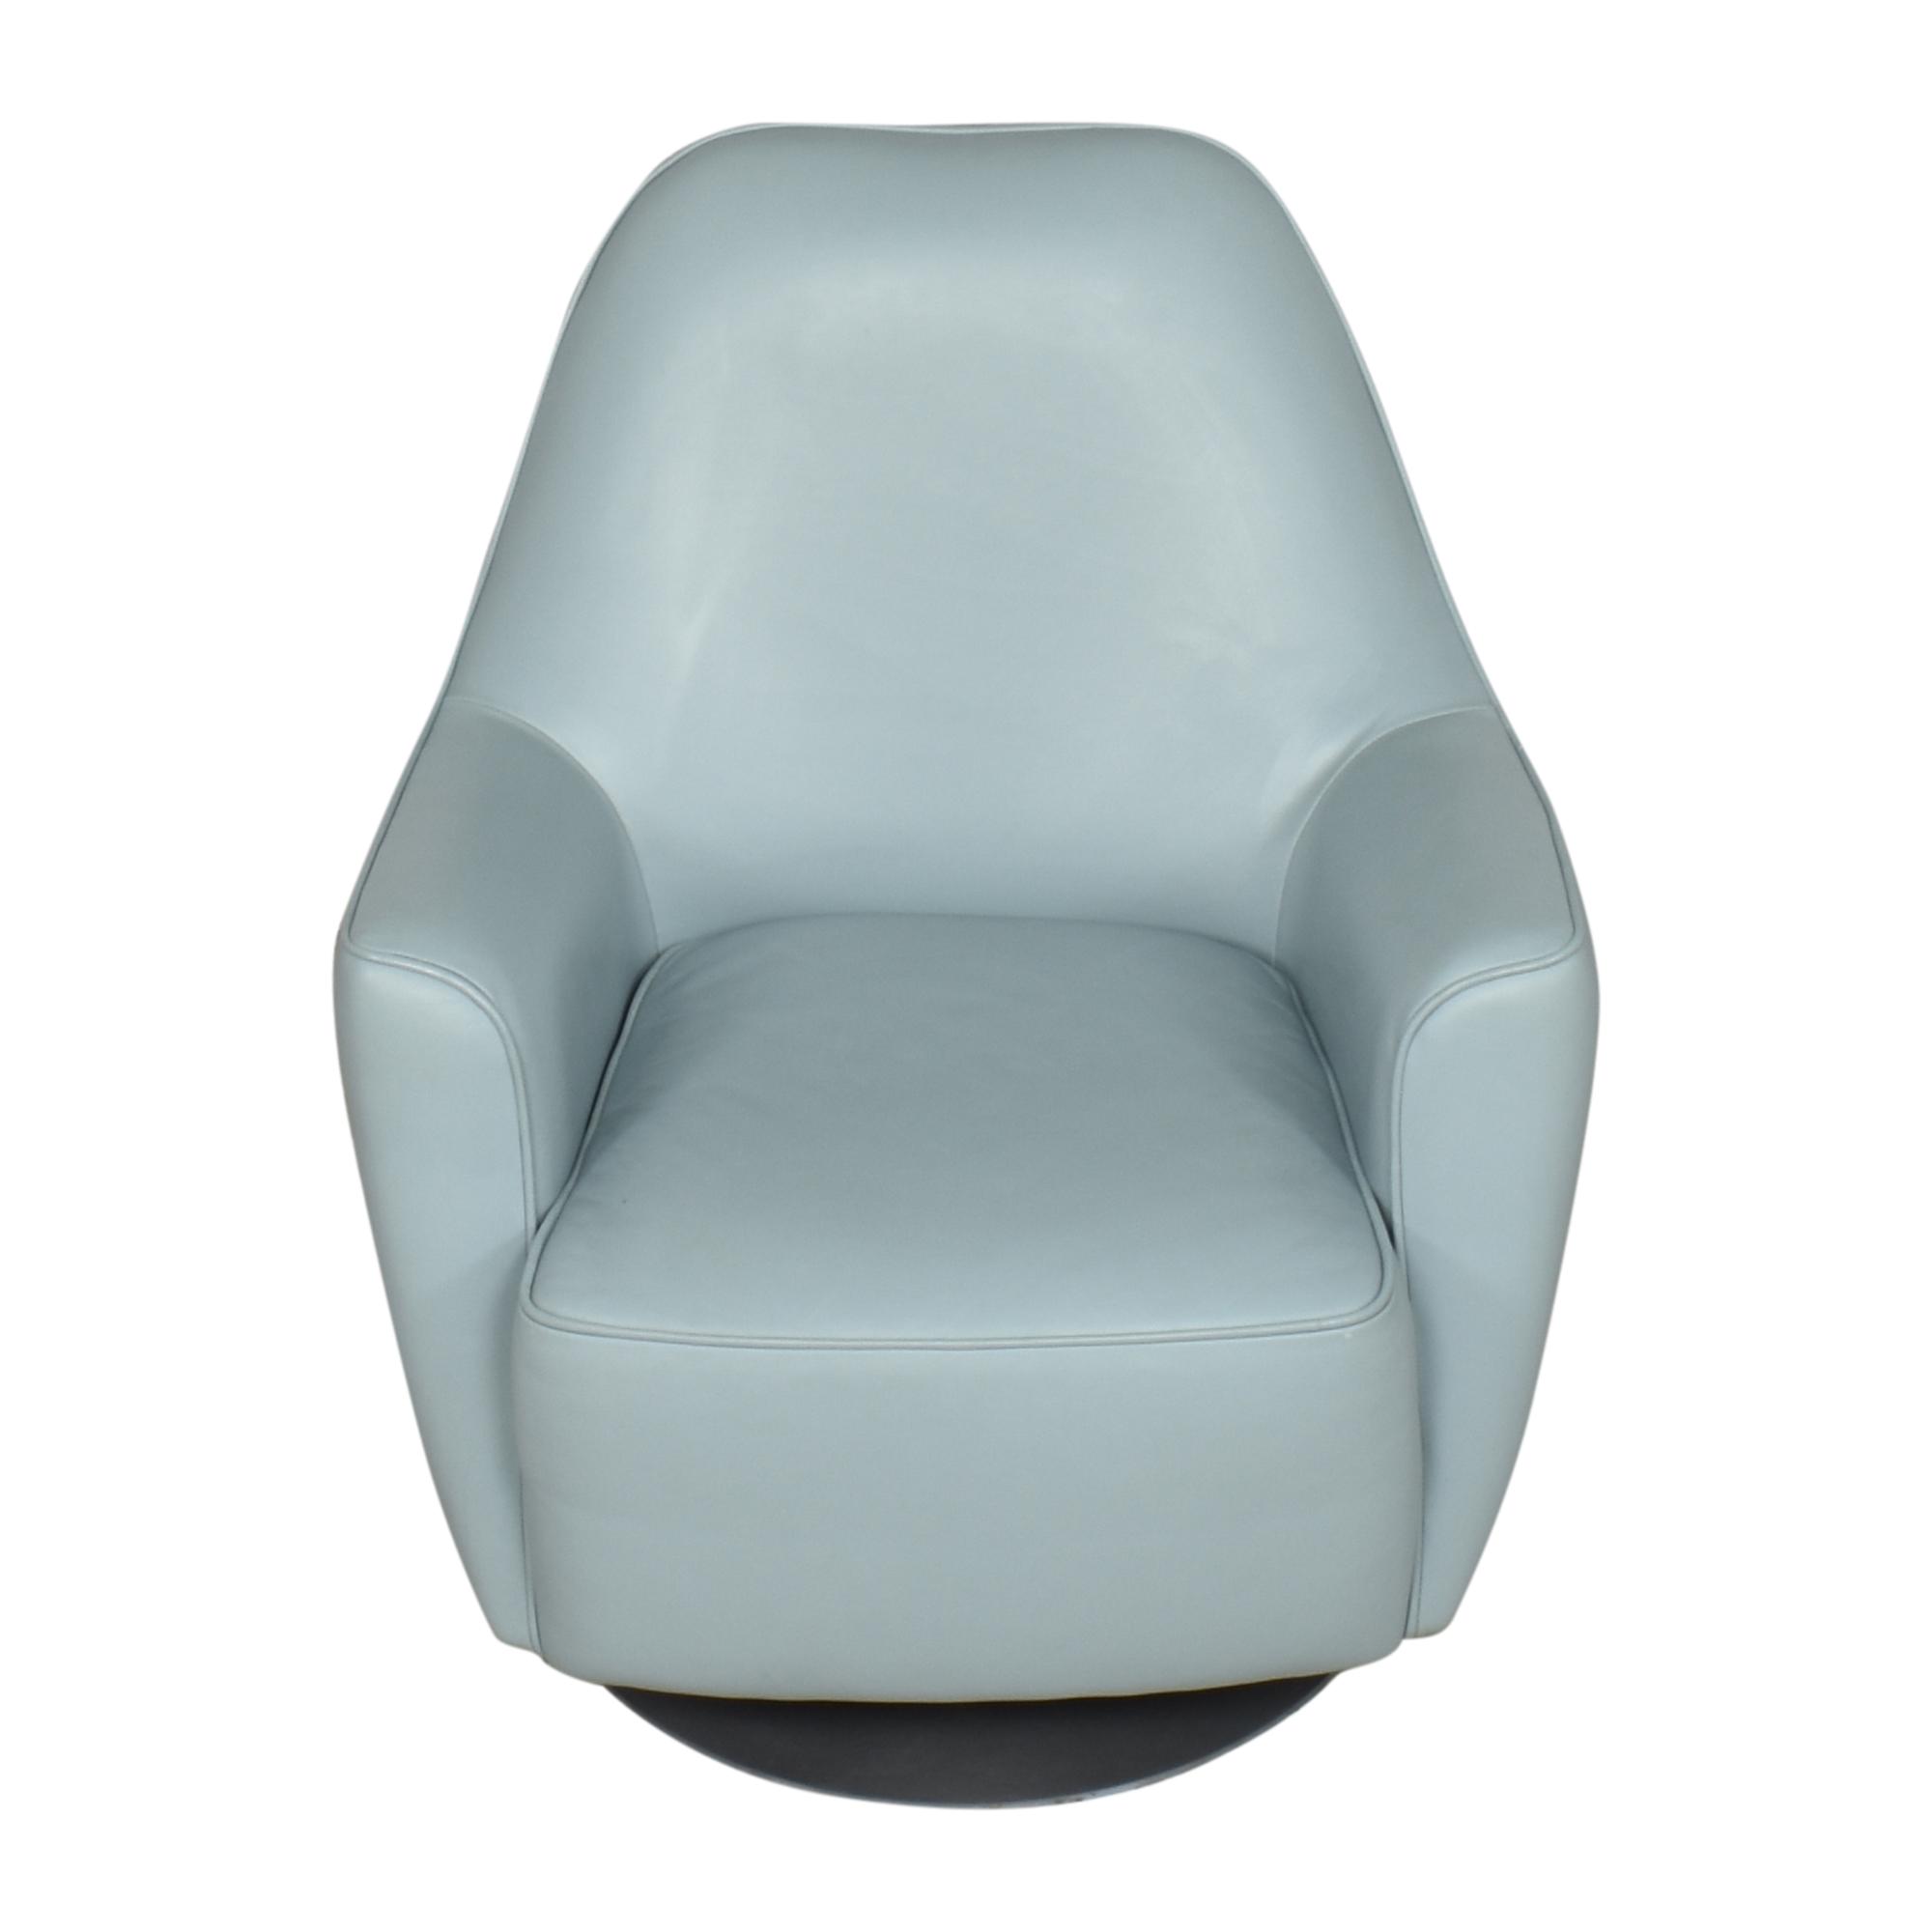 Room & Board Modern Swivel Chair / Chairs